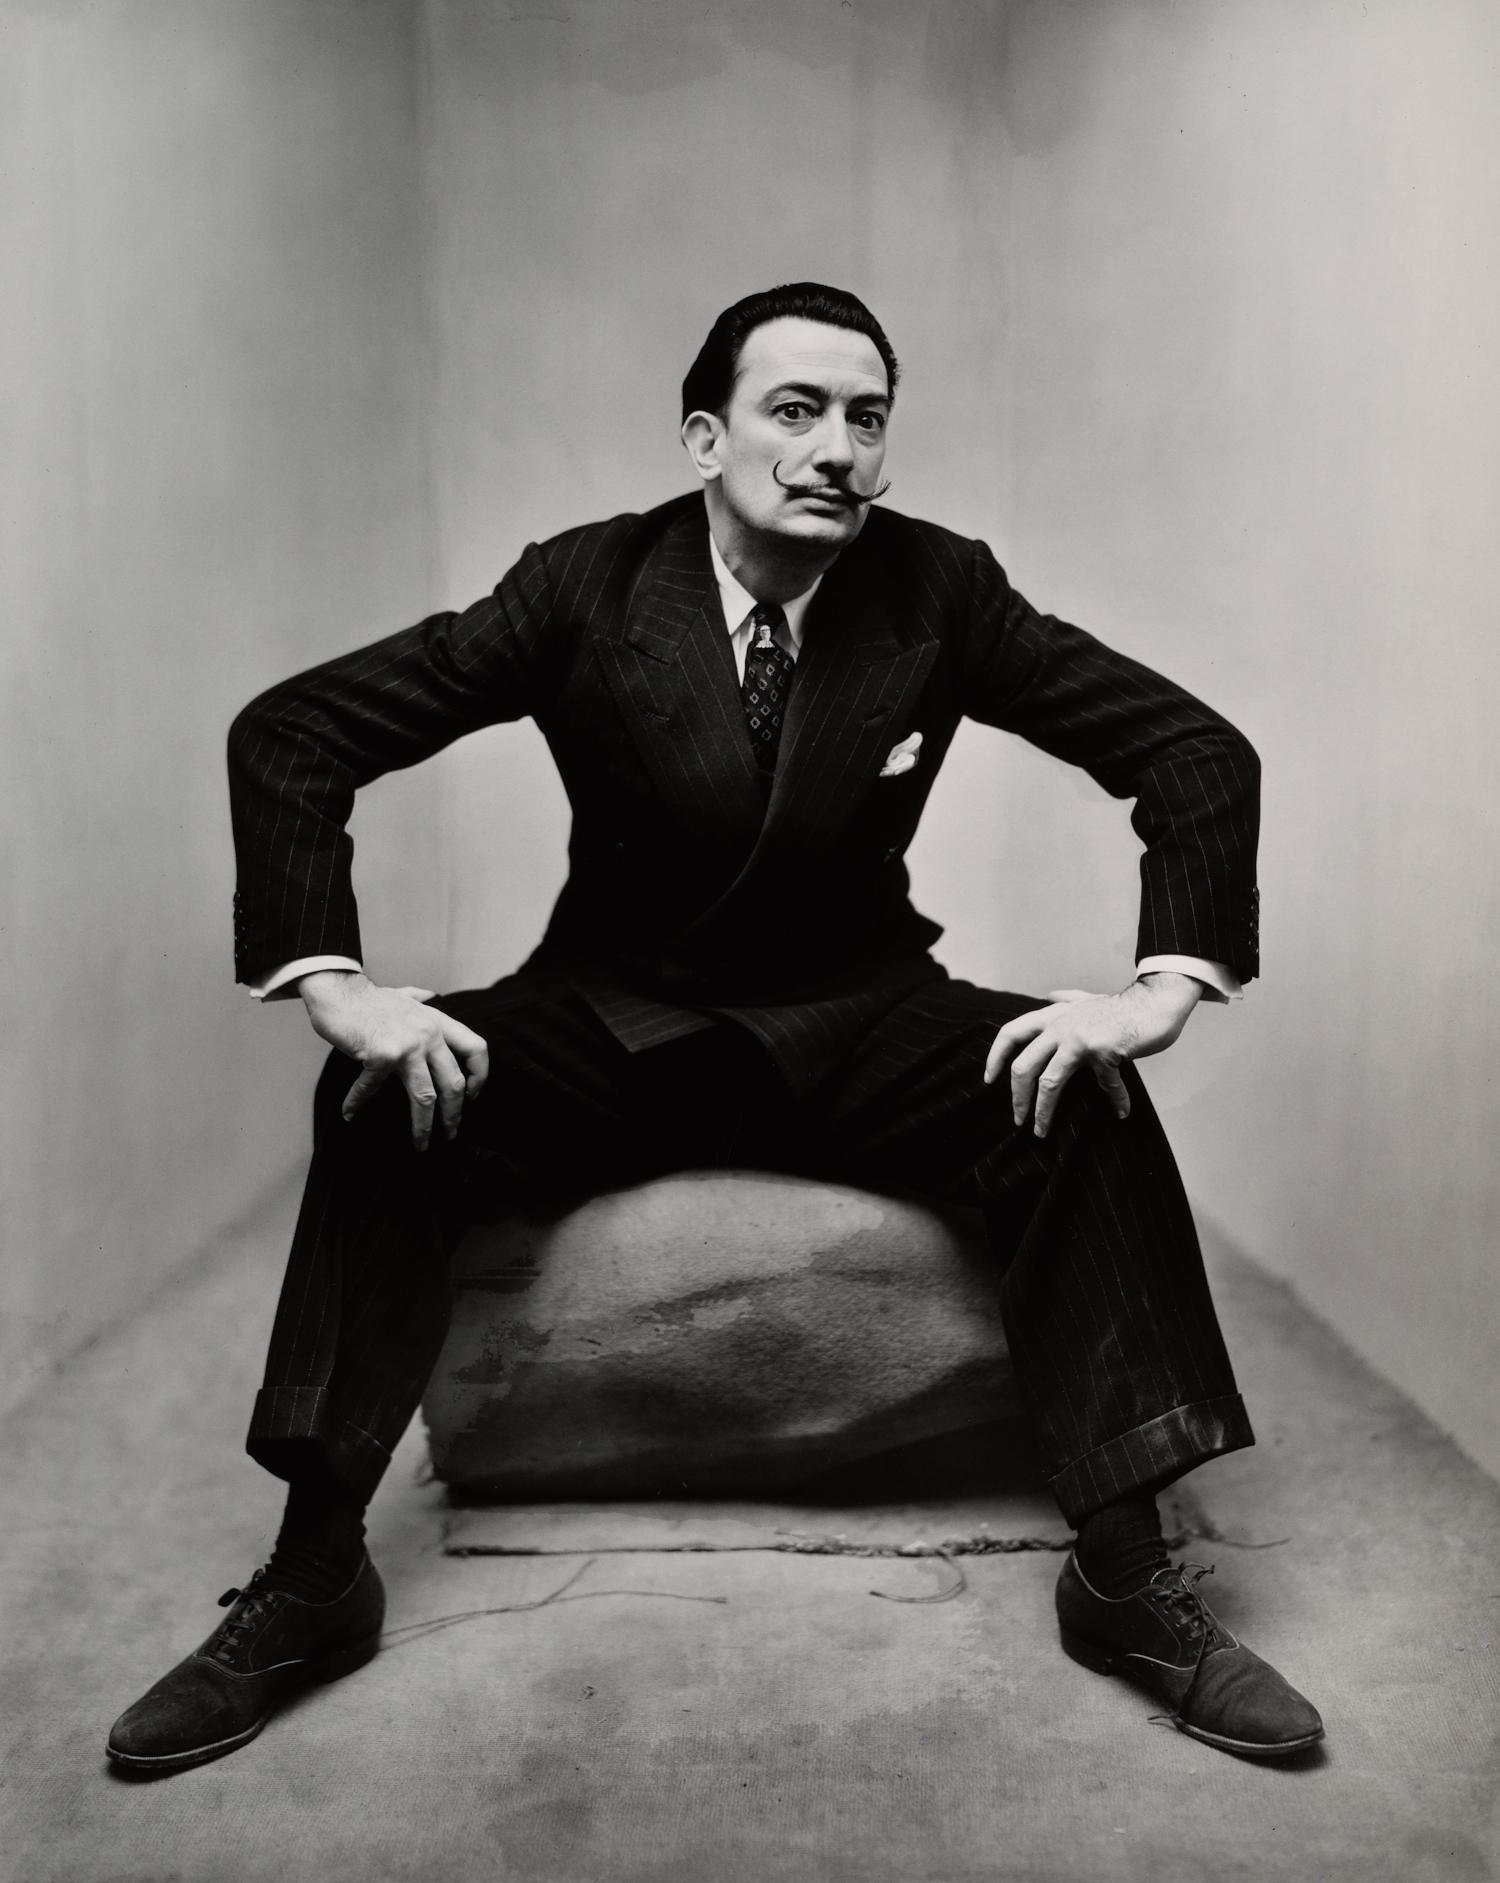 Salvador Dalí (1 of 3), New York, 1947 © The Irving Penn Foundation